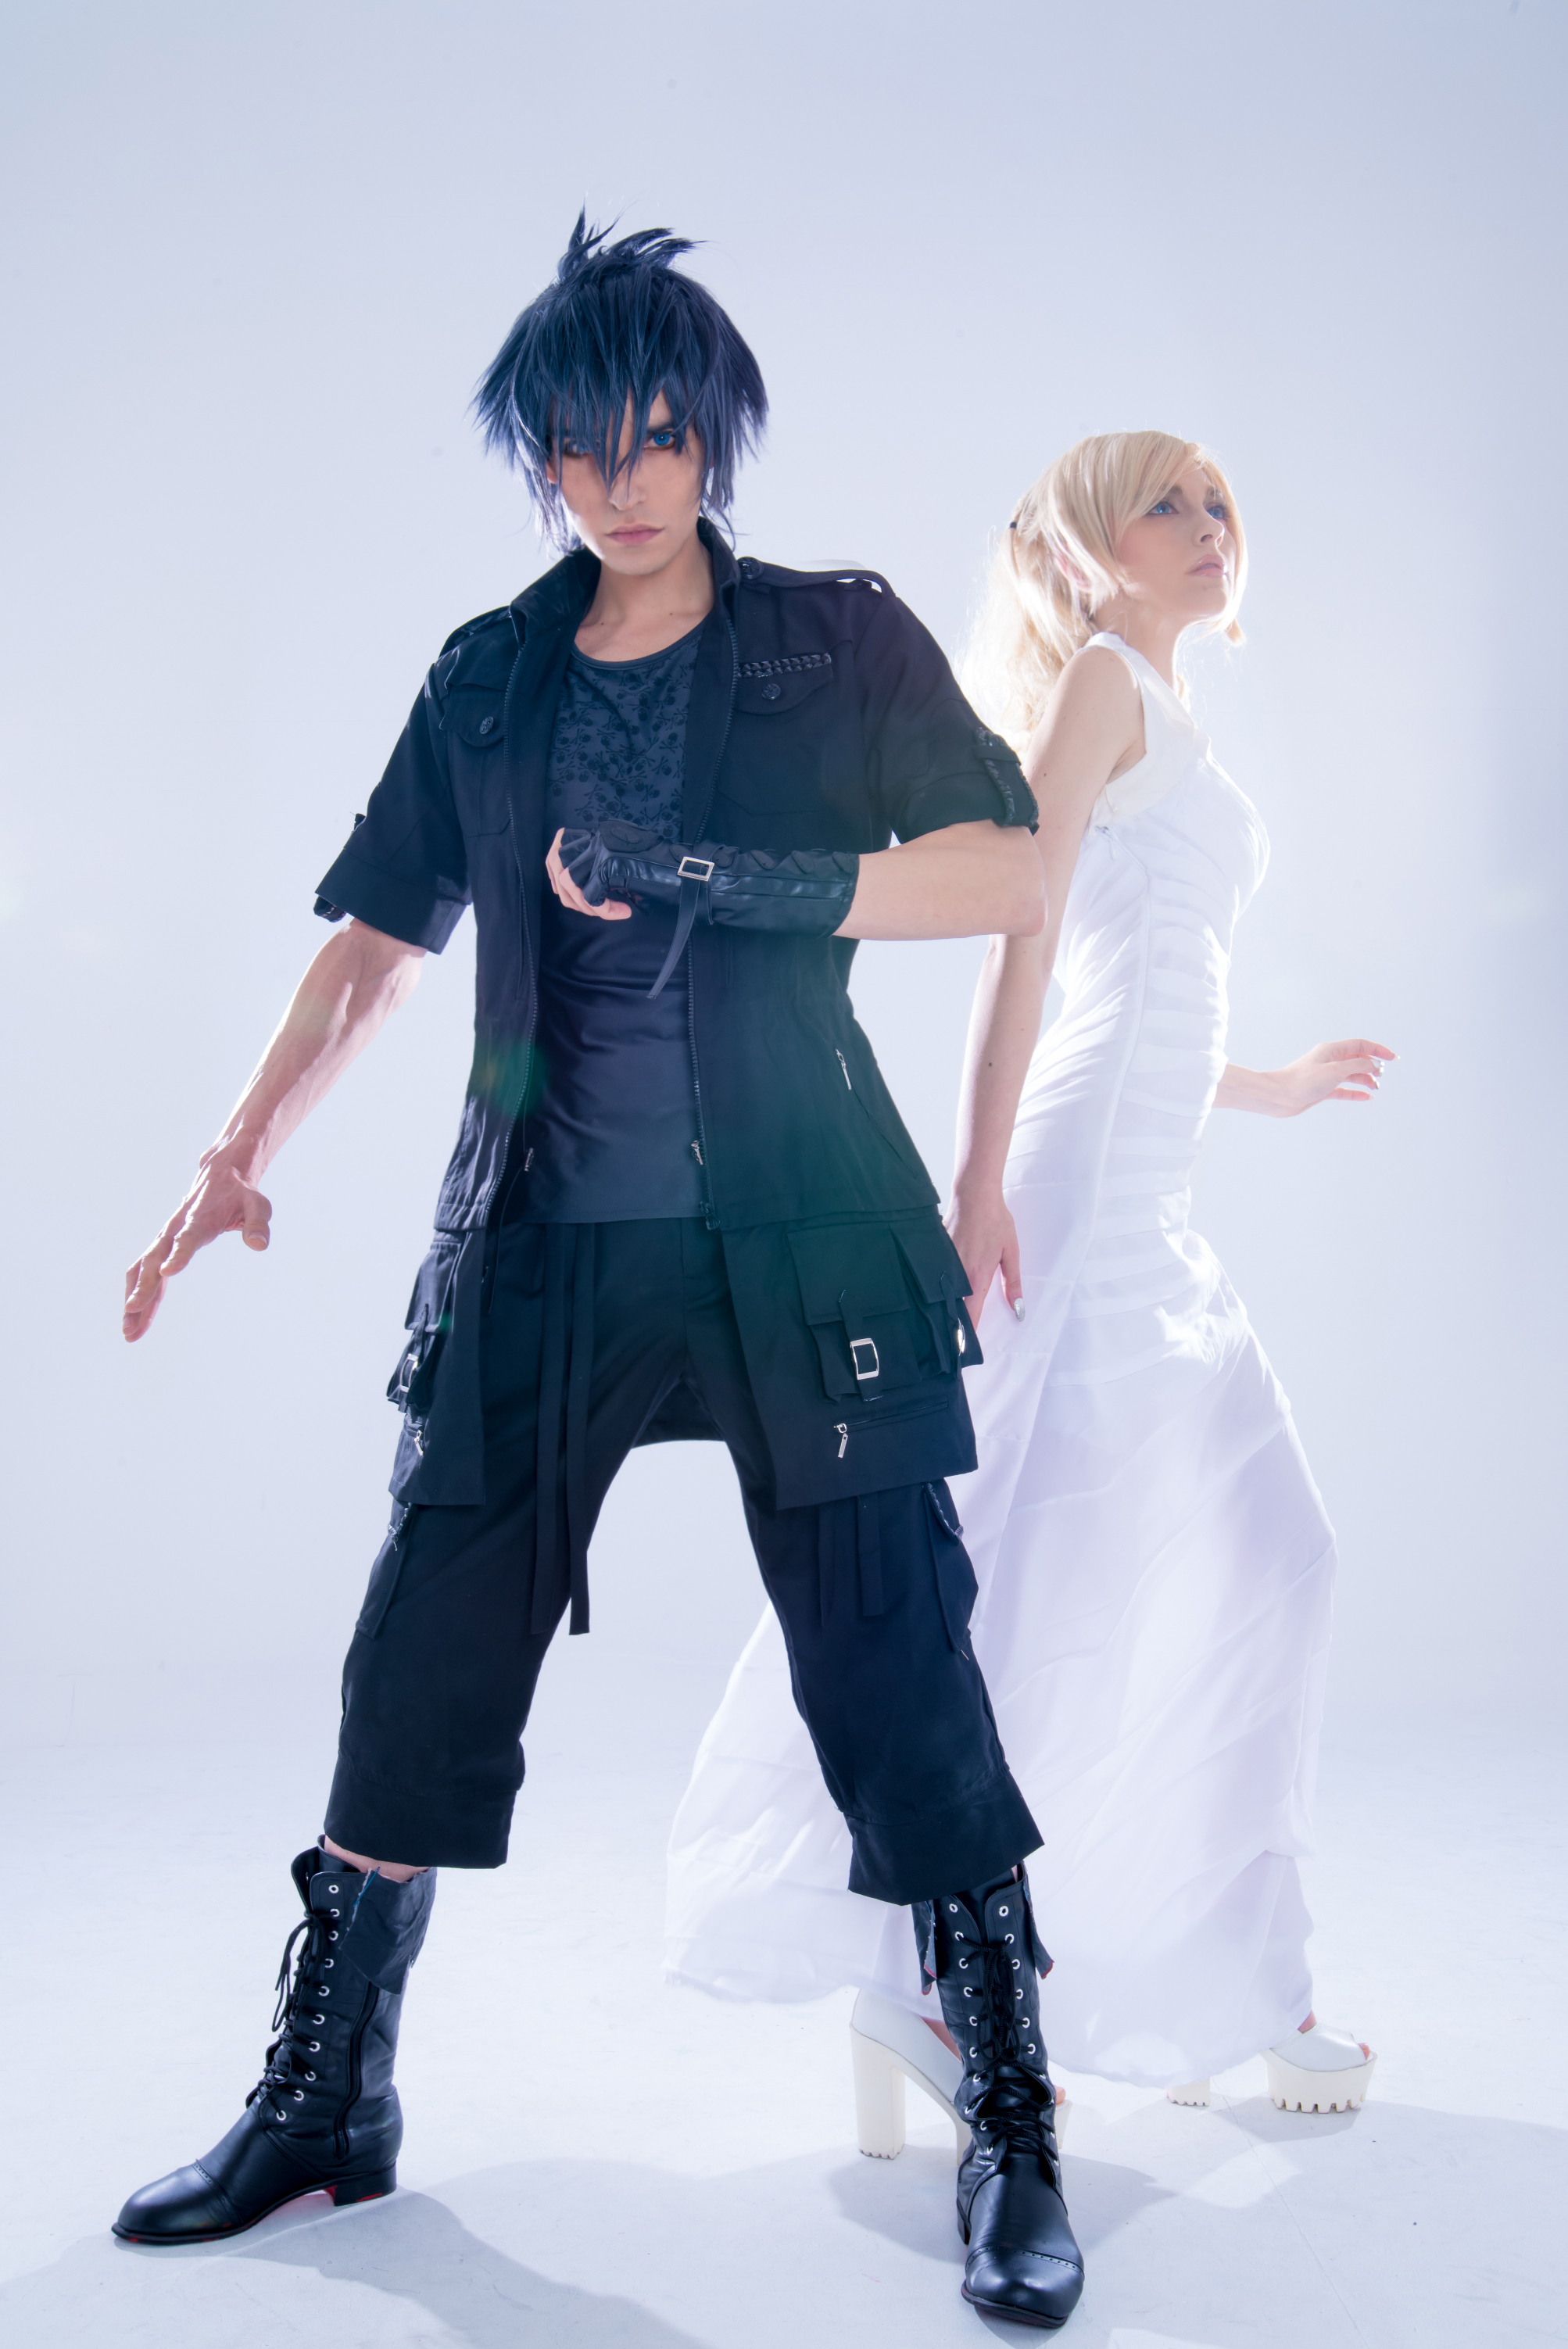 Final Fantasy XV Noctis and Lunafreya